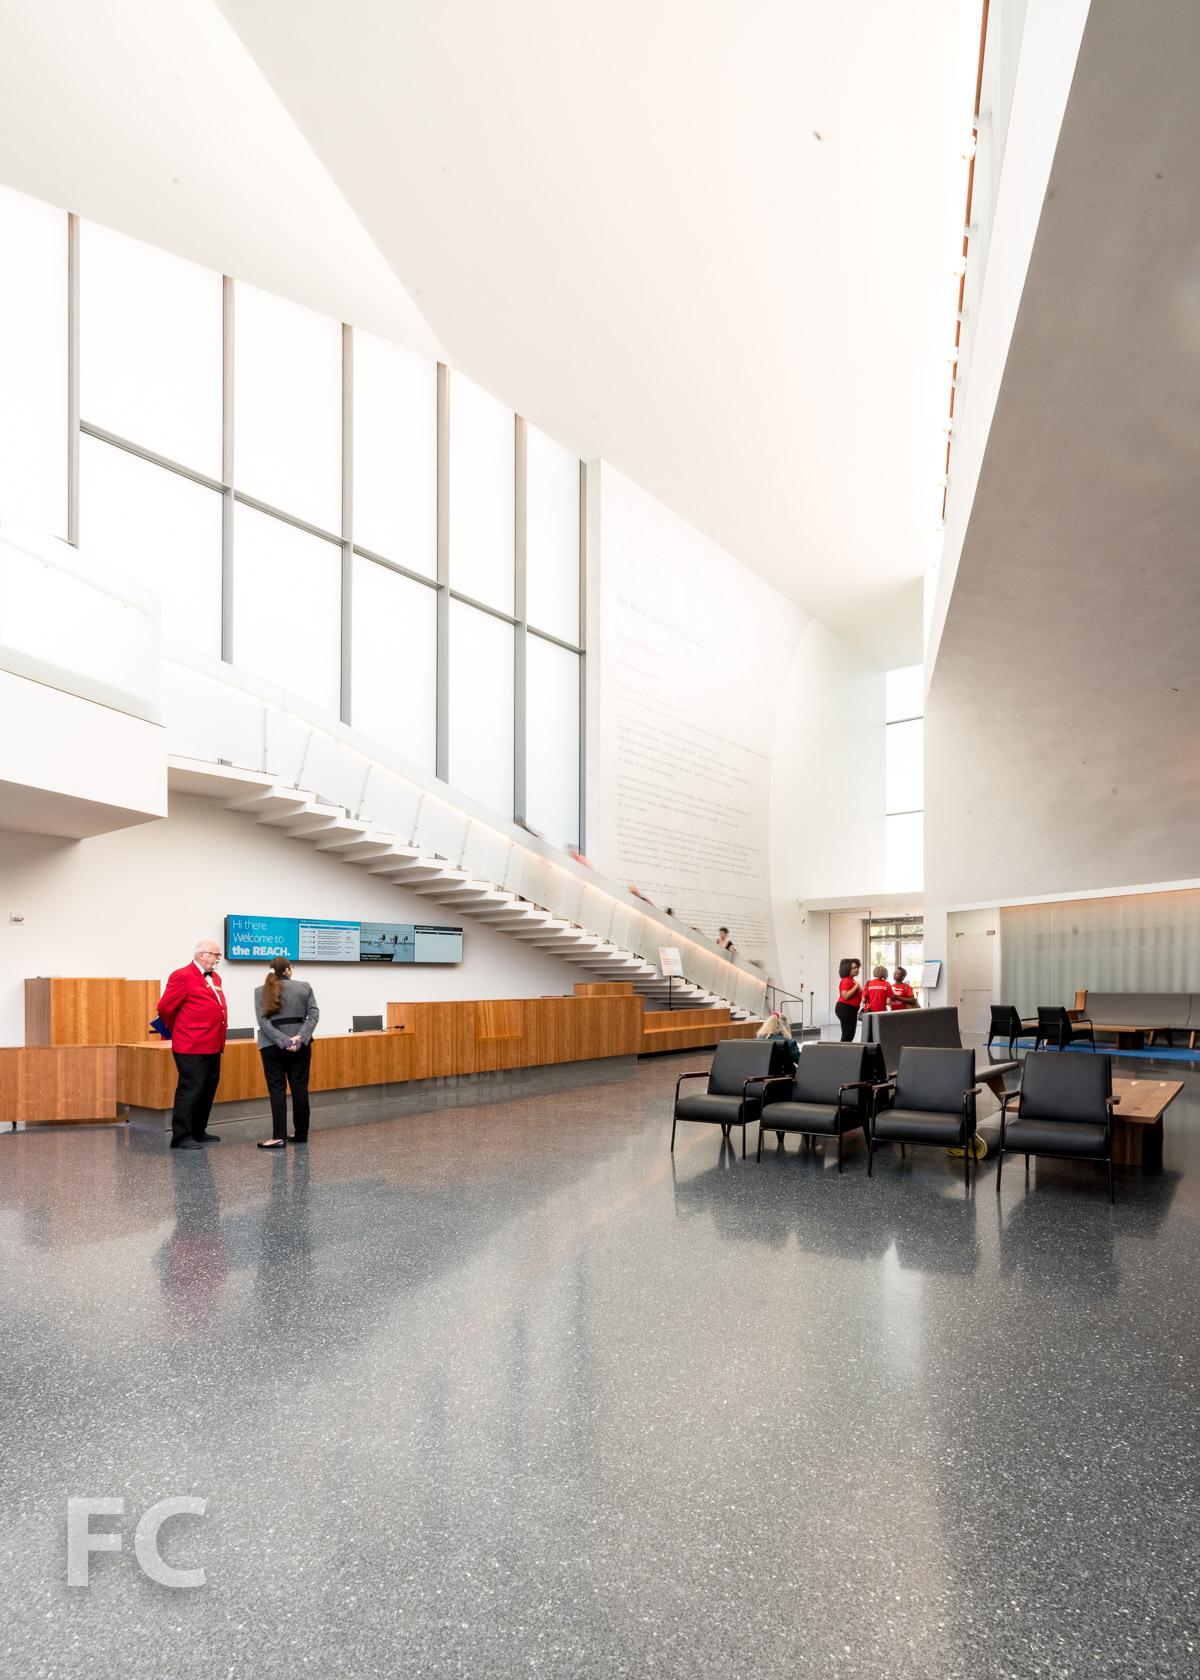 20190518-The Reach at the Kennedy Center-DSC04829-Edit.jpg